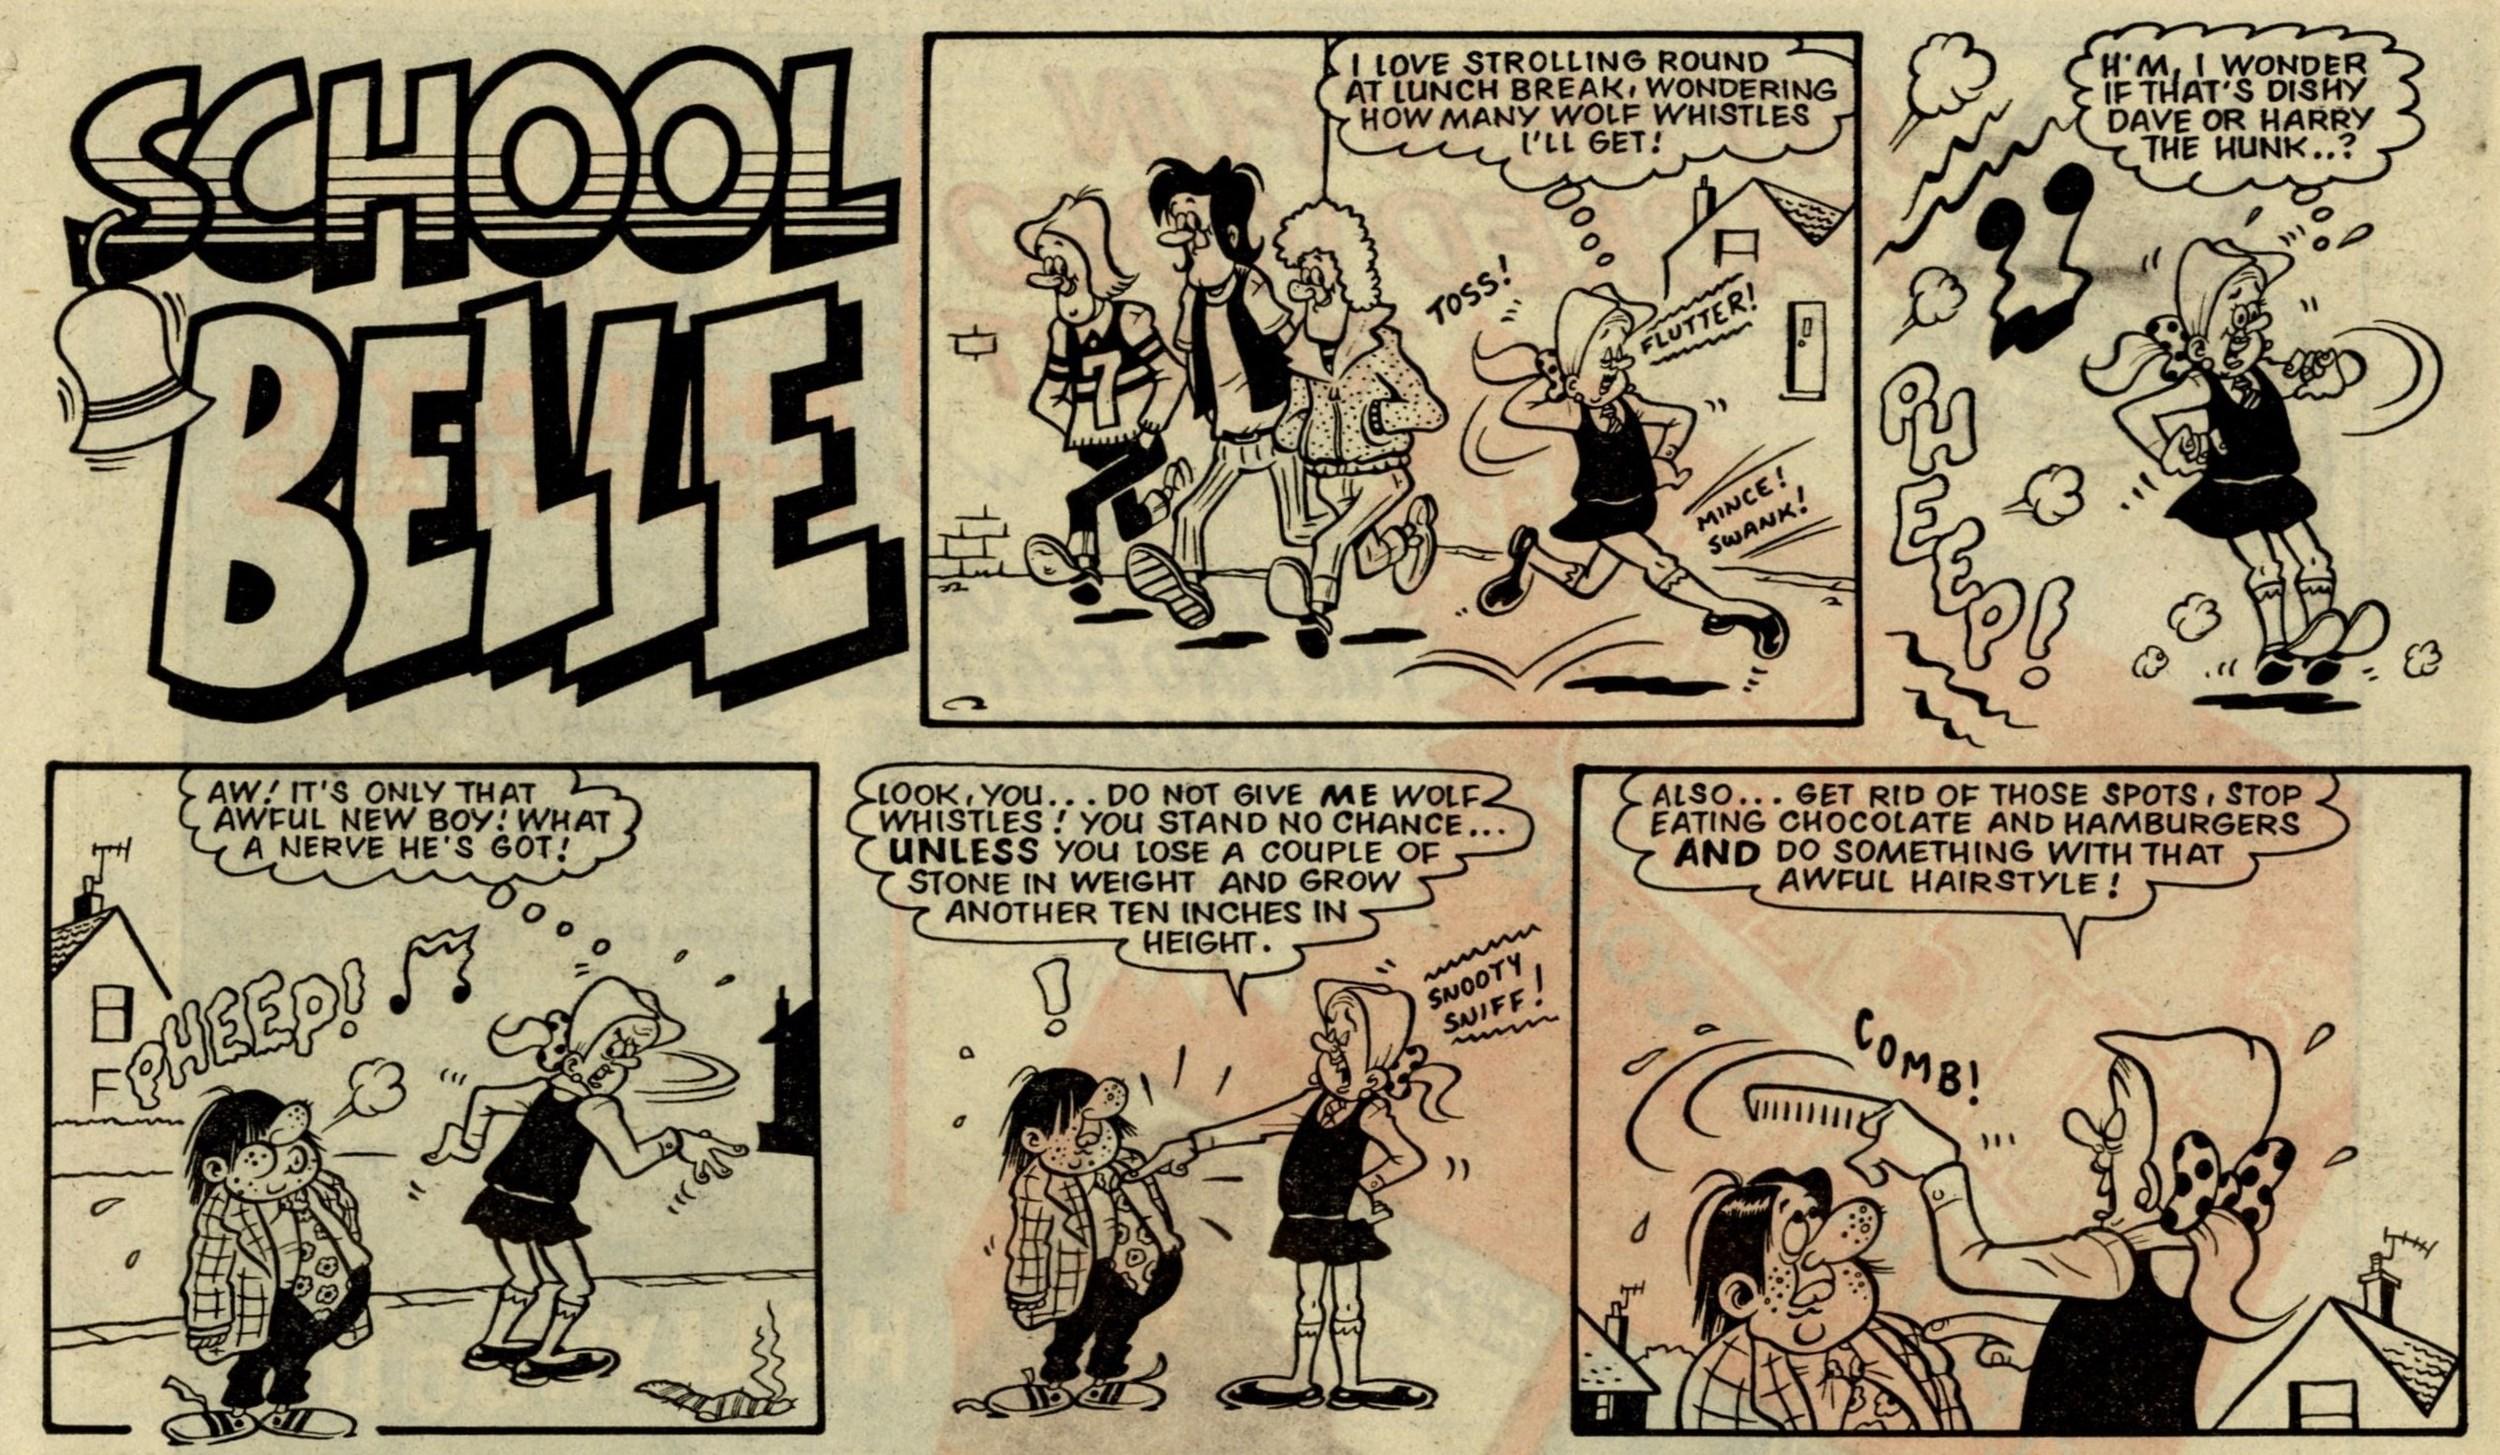 School Belle: Tom Paterson (artist)